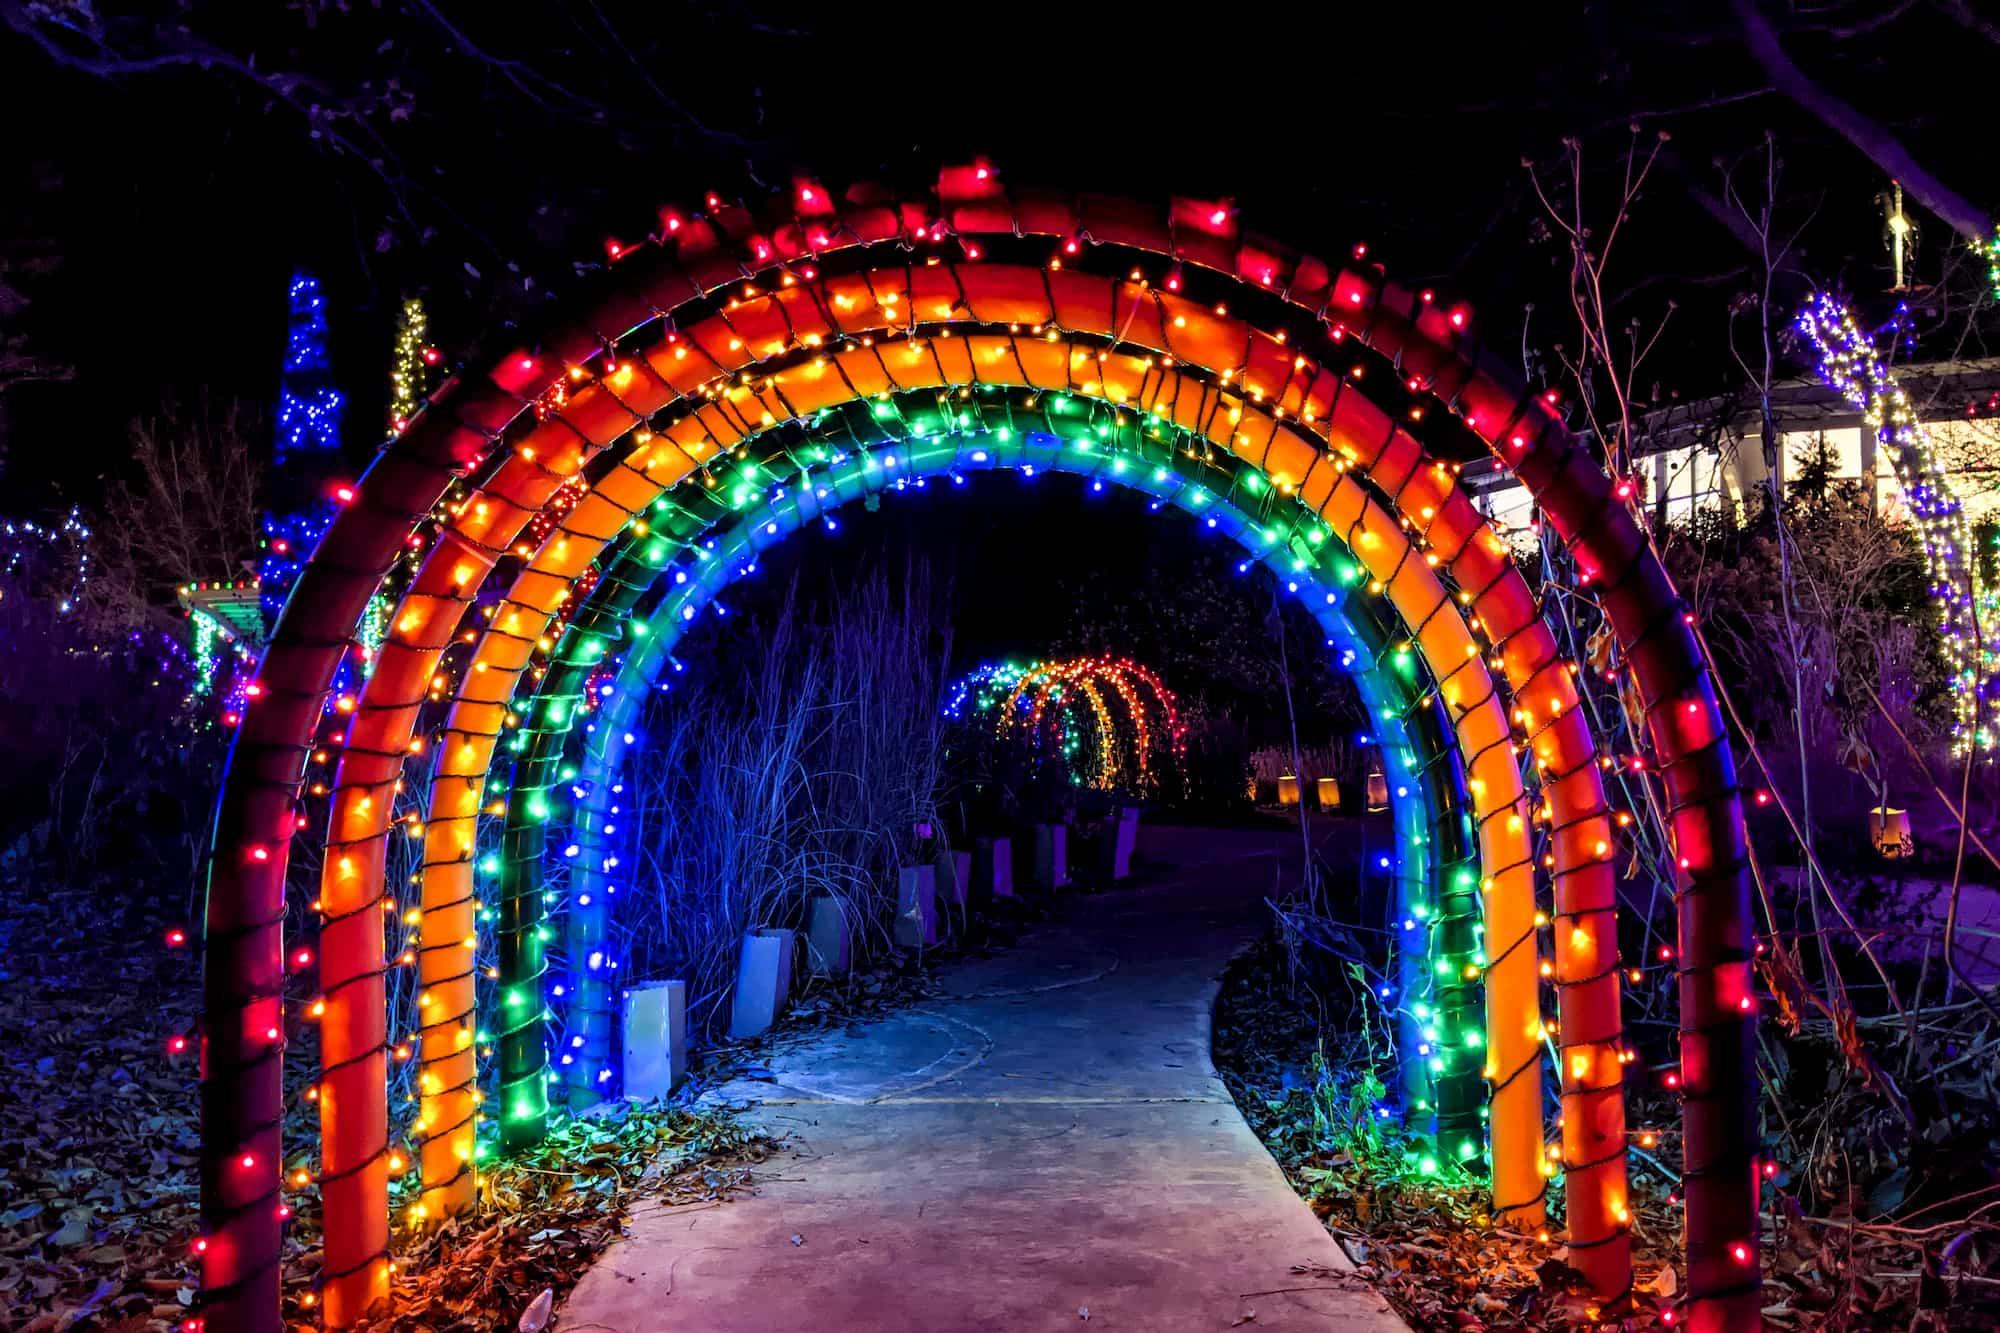 Christmas Light Wichita Ks 2021 Map Best Places To See Christmas Lights In Wichita 2020